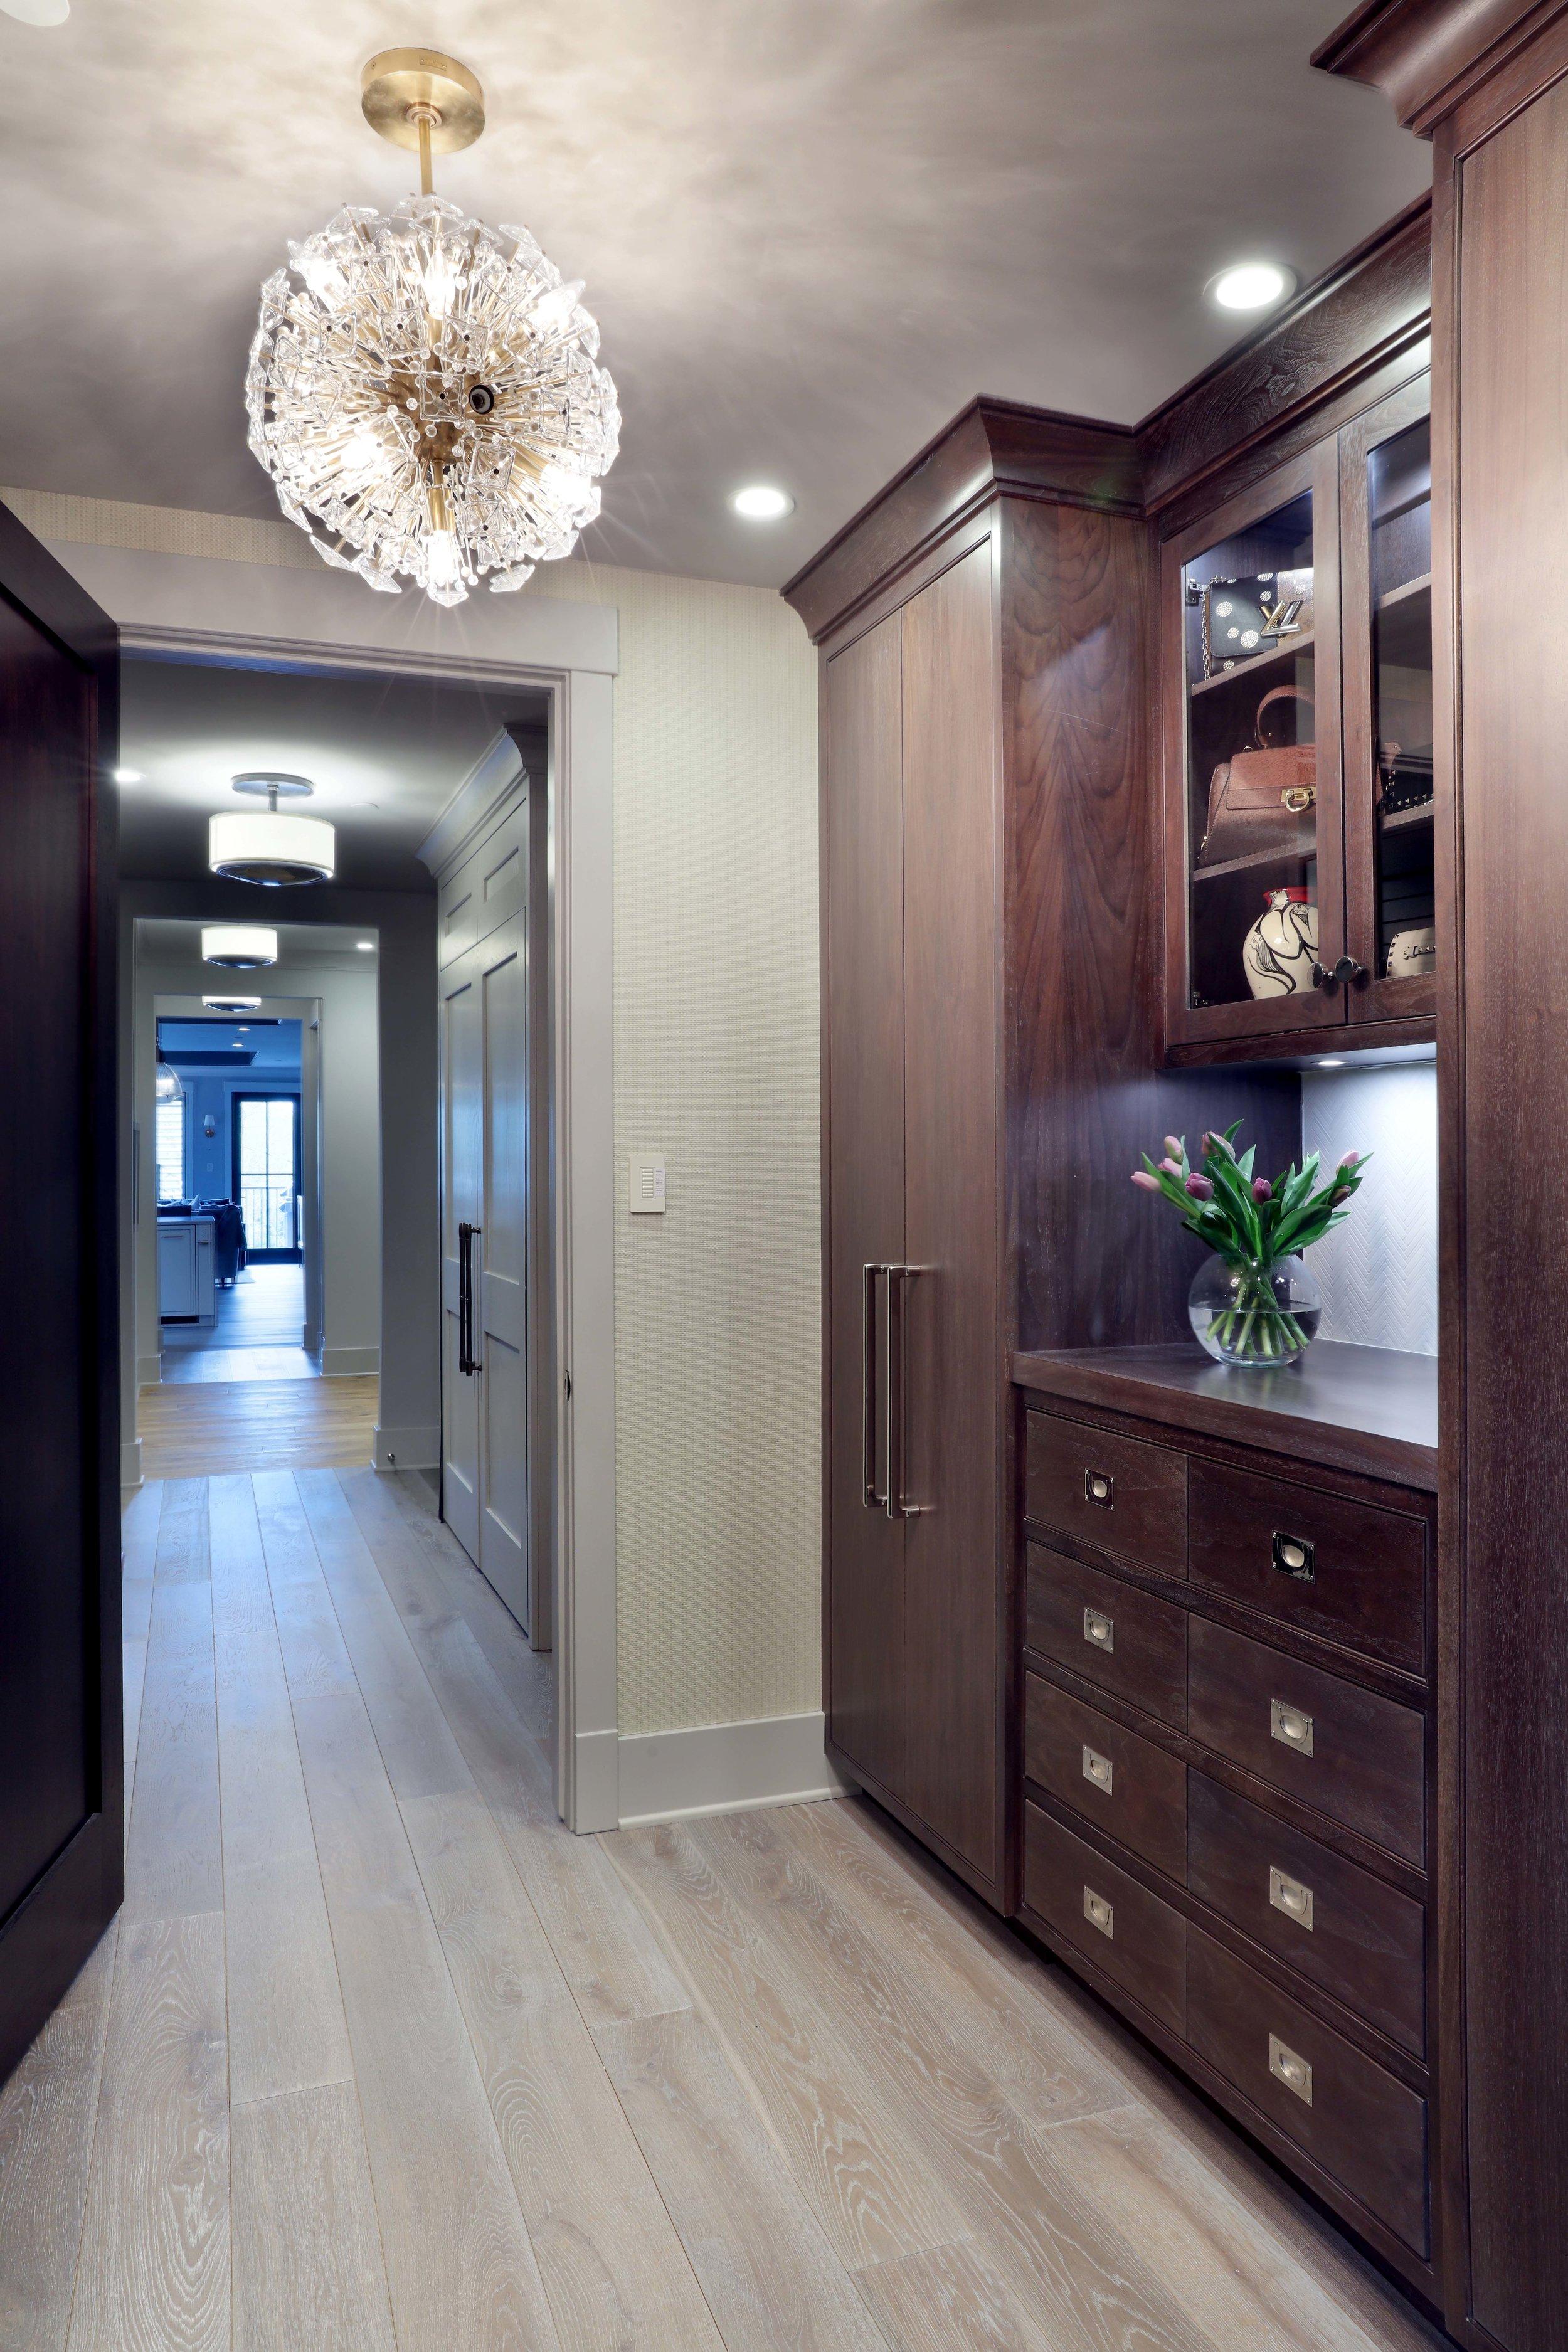 Vision-Interiors-Visbeen-Showroom-Grand-Rapids-Hallway-Storage.jpg